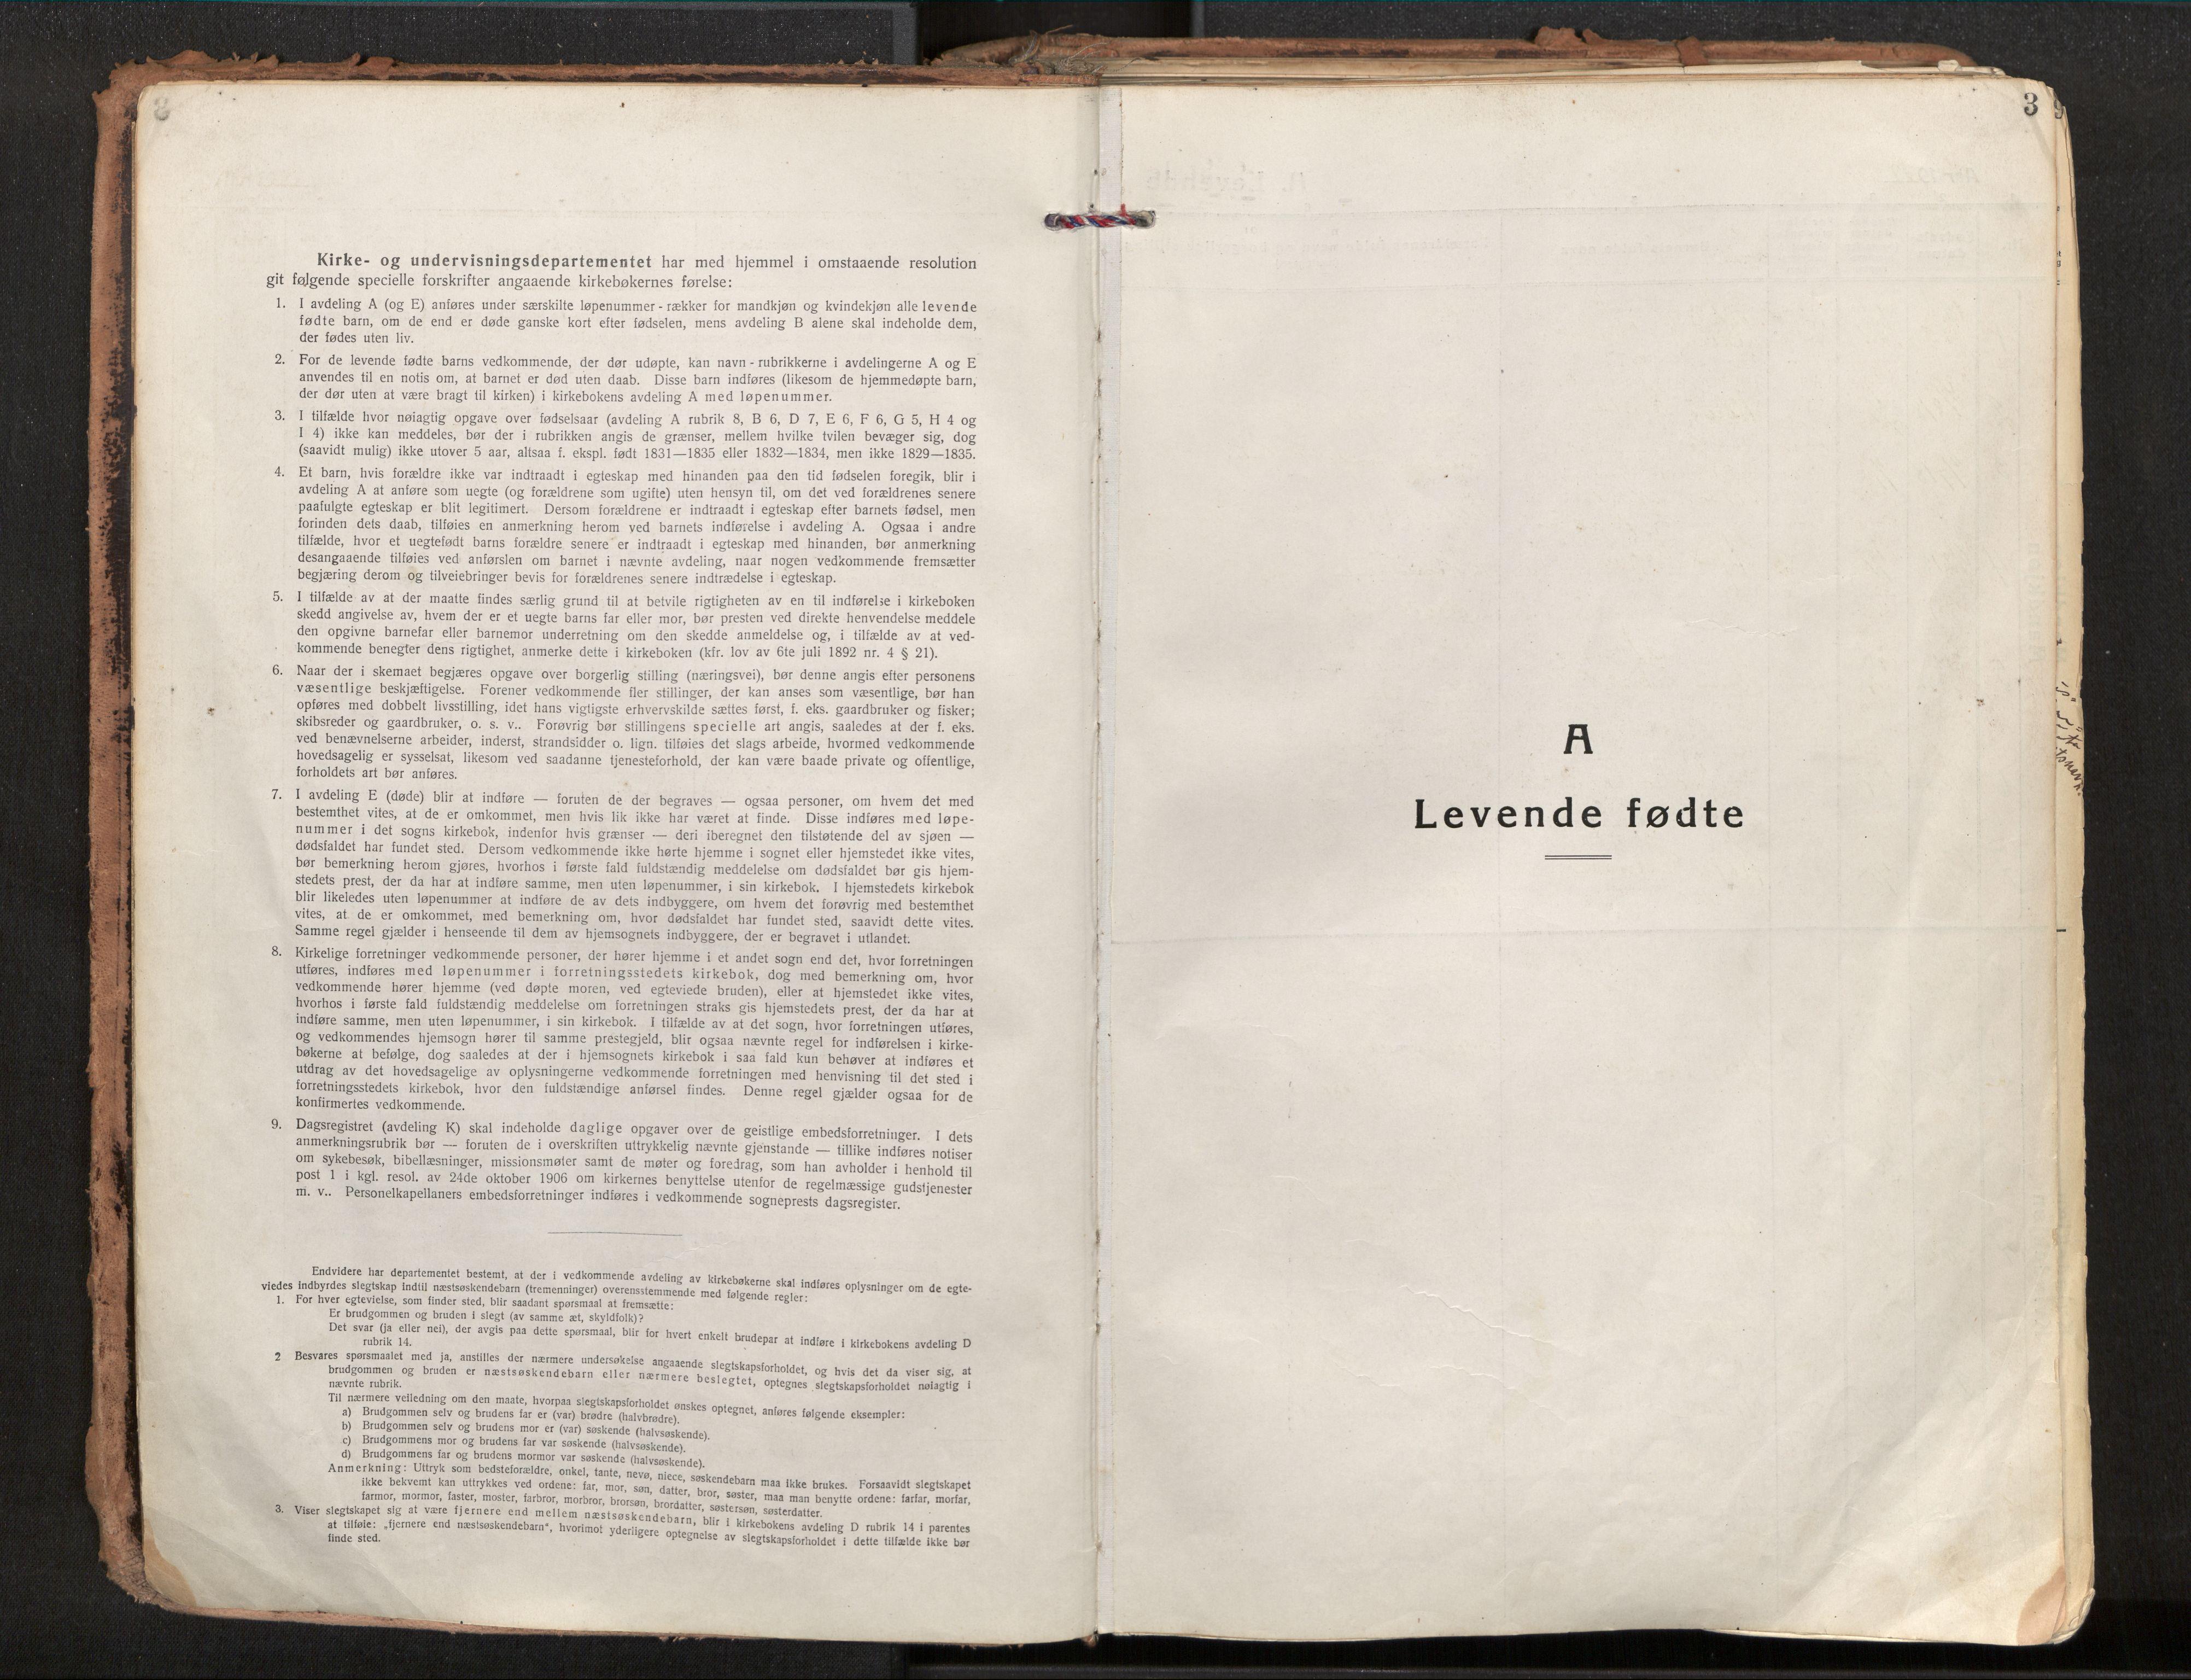 SAT, Ministerialprotokoller, klokkerbøker og fødselsregistre - Nordland, 881/L1160: Ministerialbok nr. 881A13, 1919-1937, s. 3